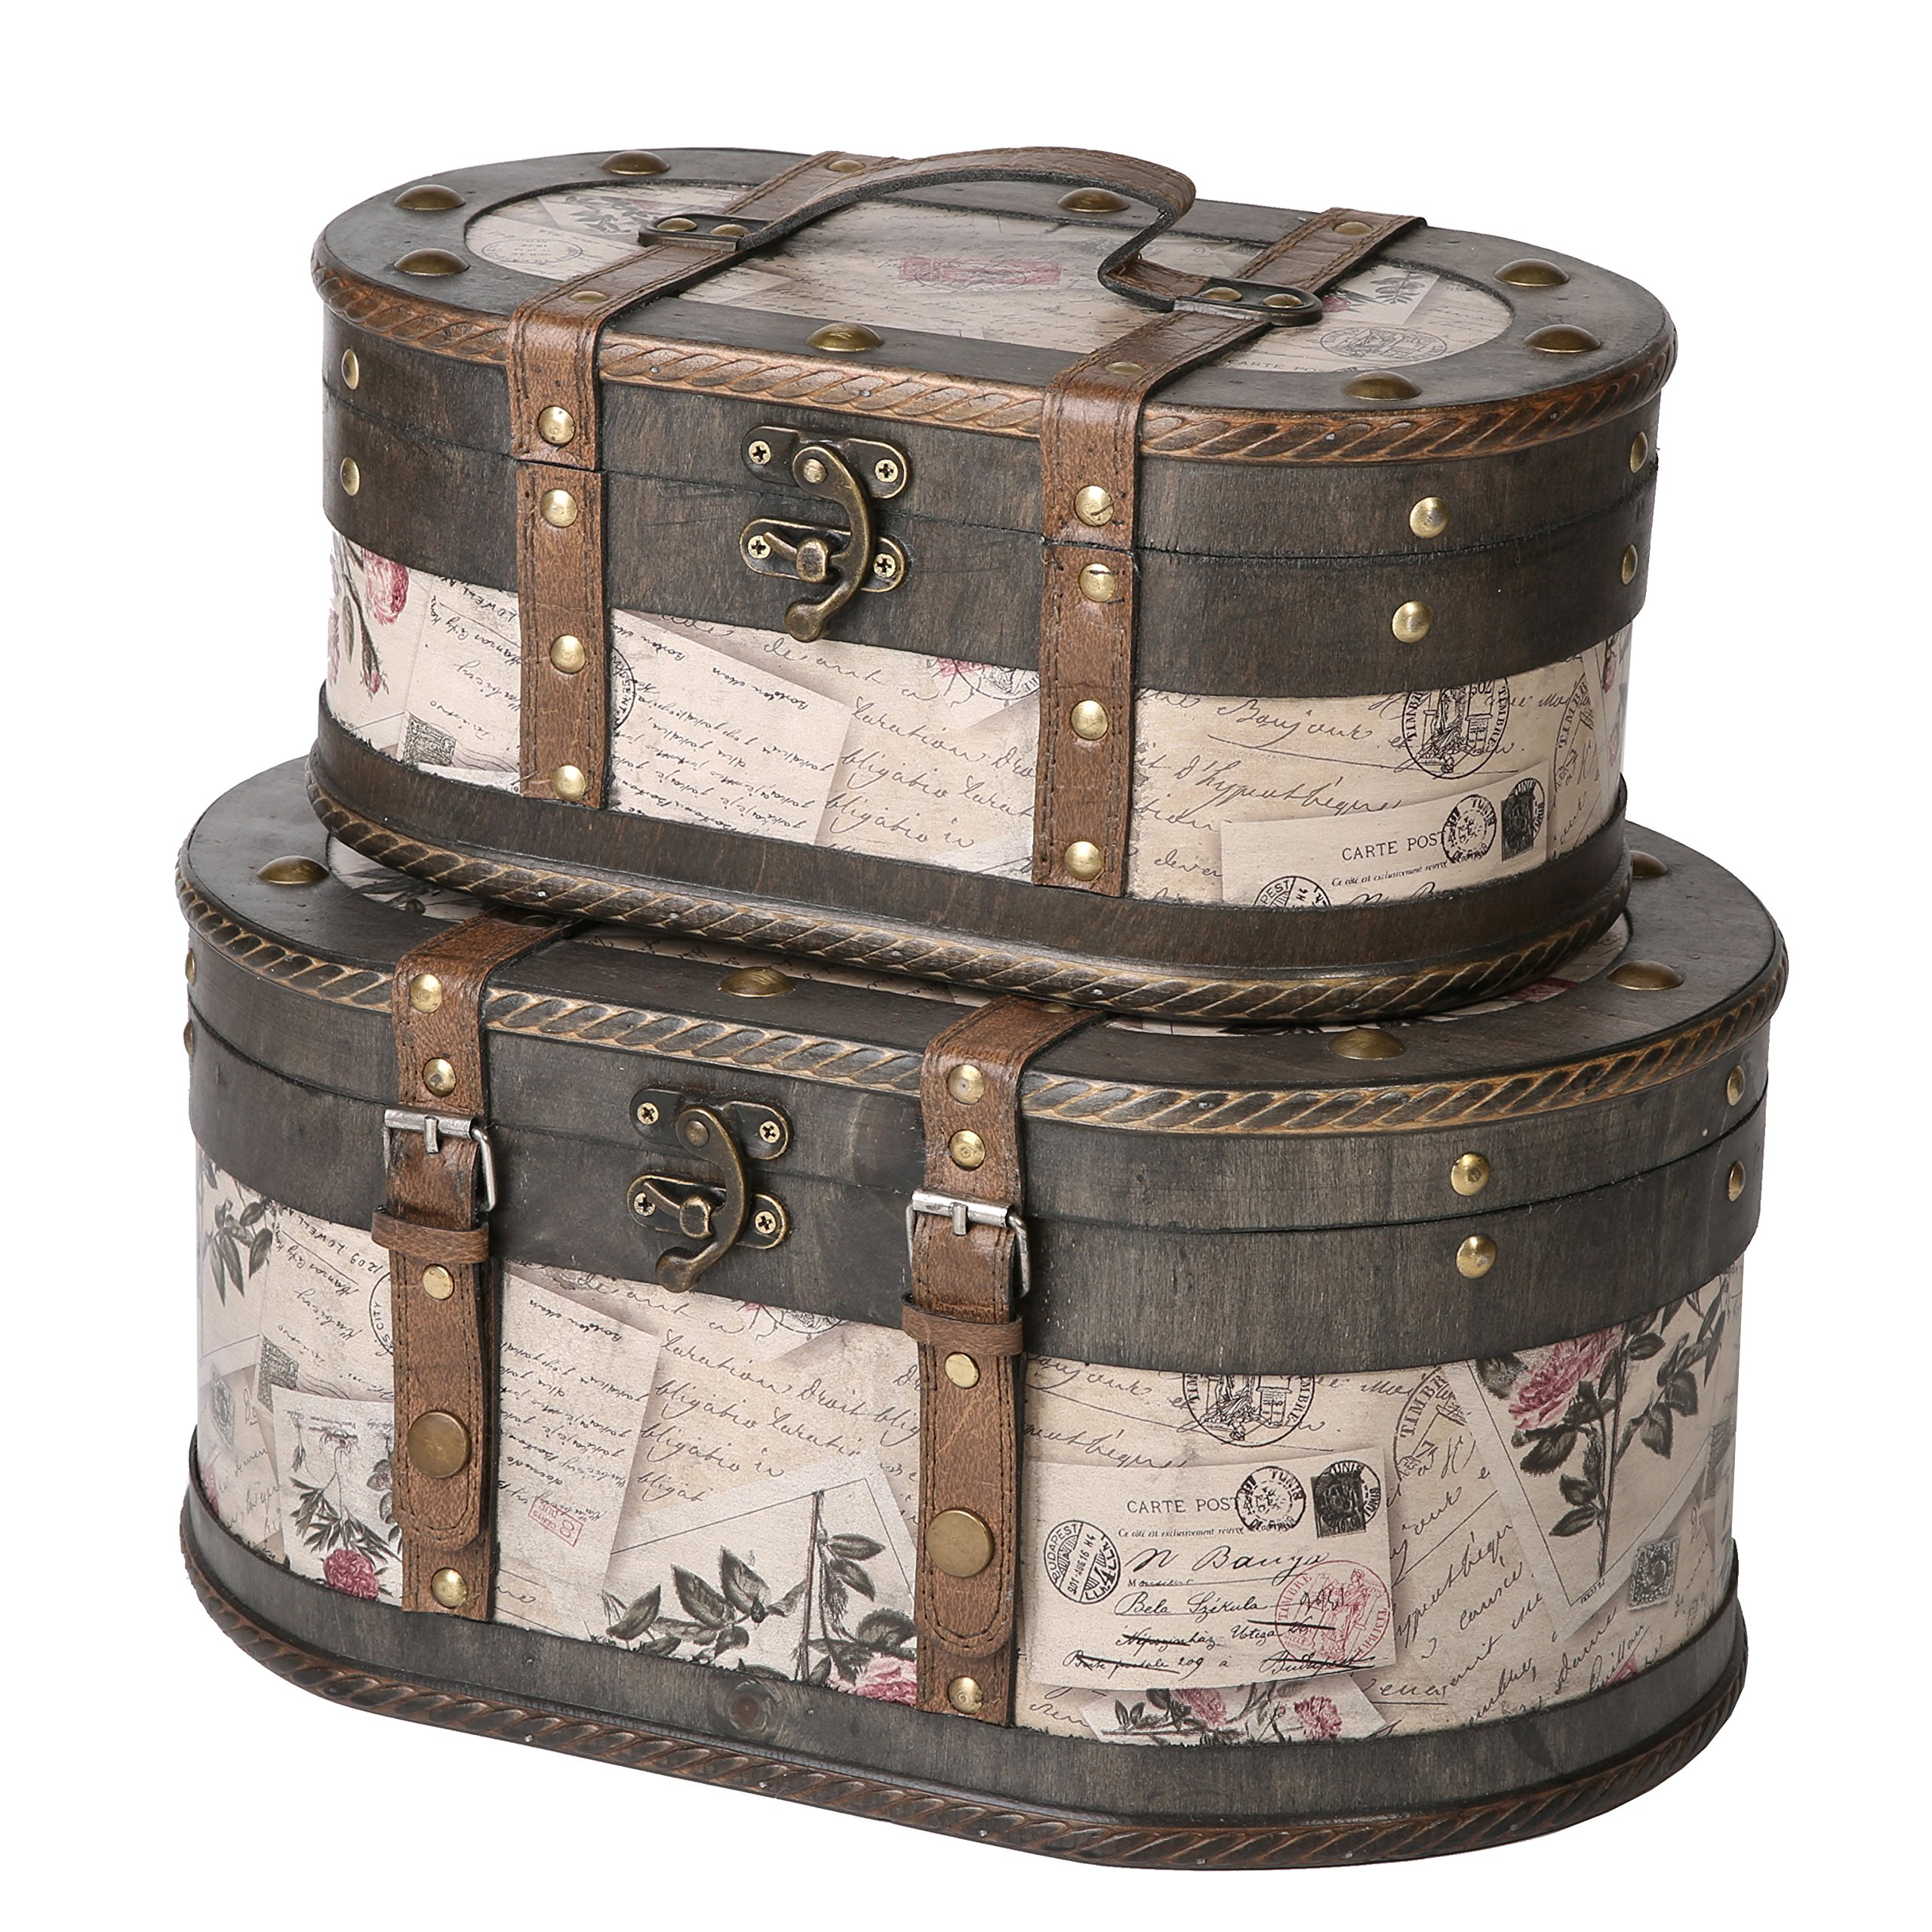 SLPR Alyssa Wooden Train Case (Set of 2, Roses)   Decorative Storage Trunk Vintage Themed Antique Victorian Style Treasure Storage Box